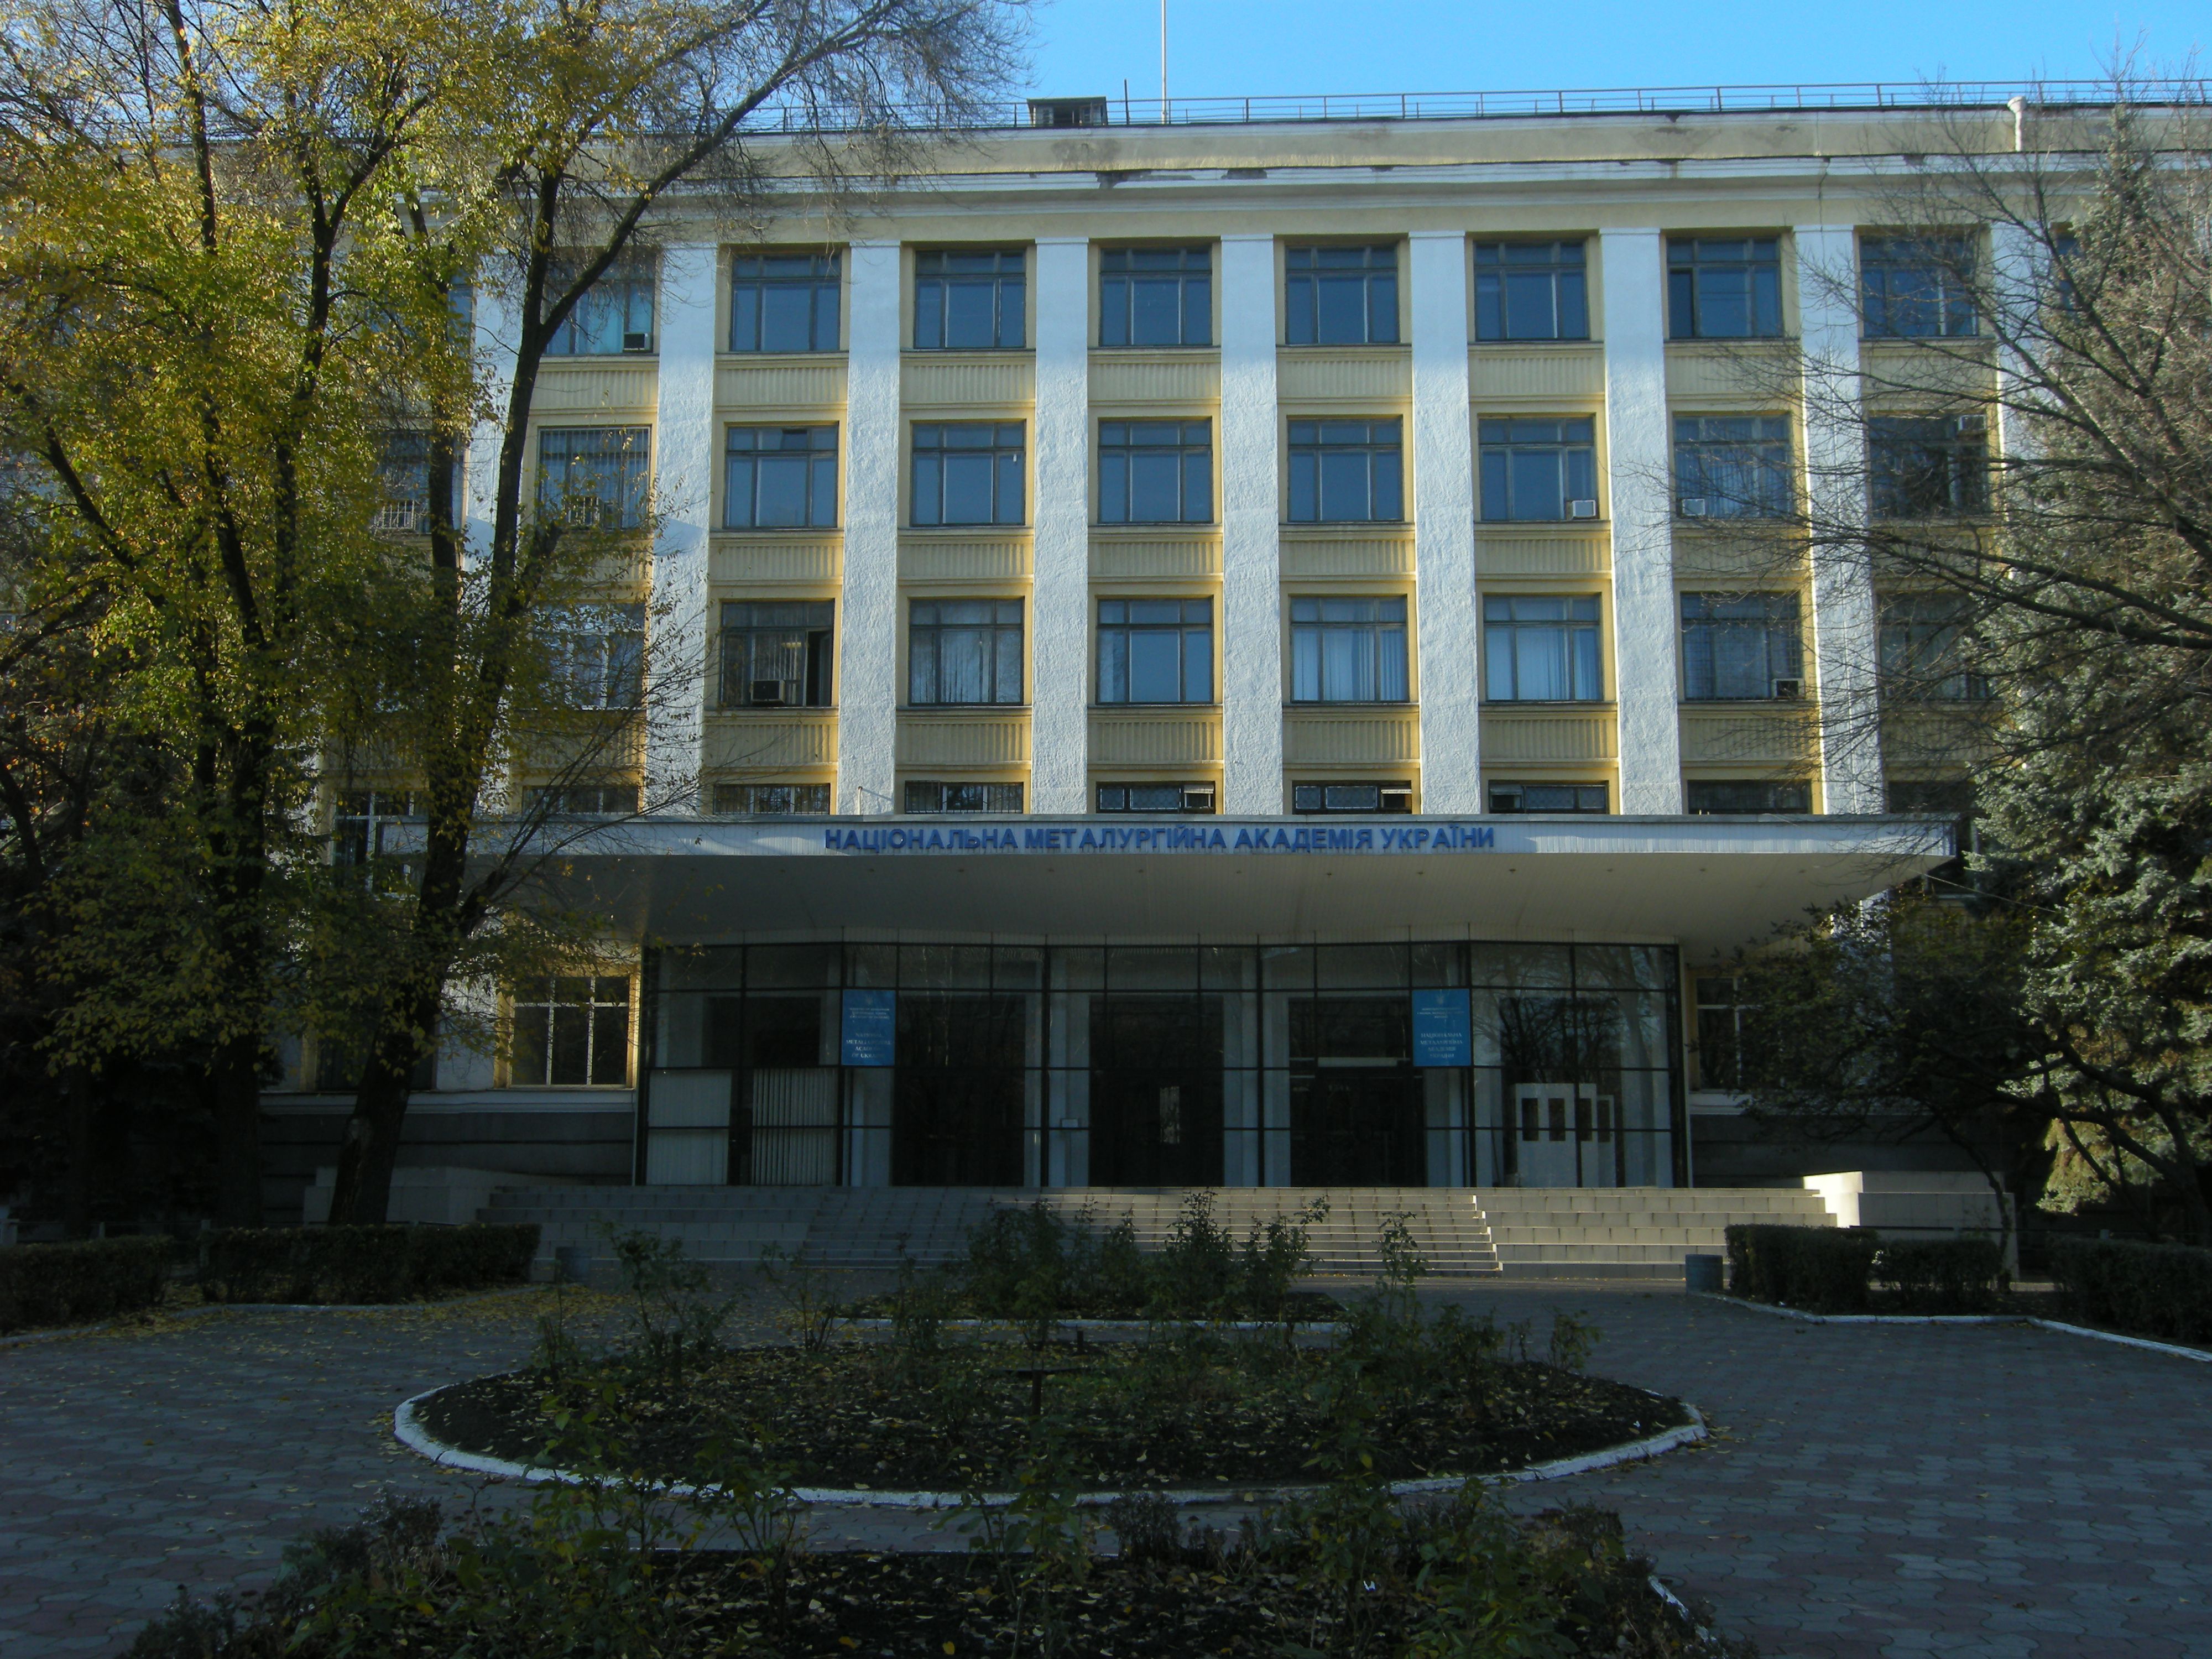 image of National Metallurgical Academy of Ukraine